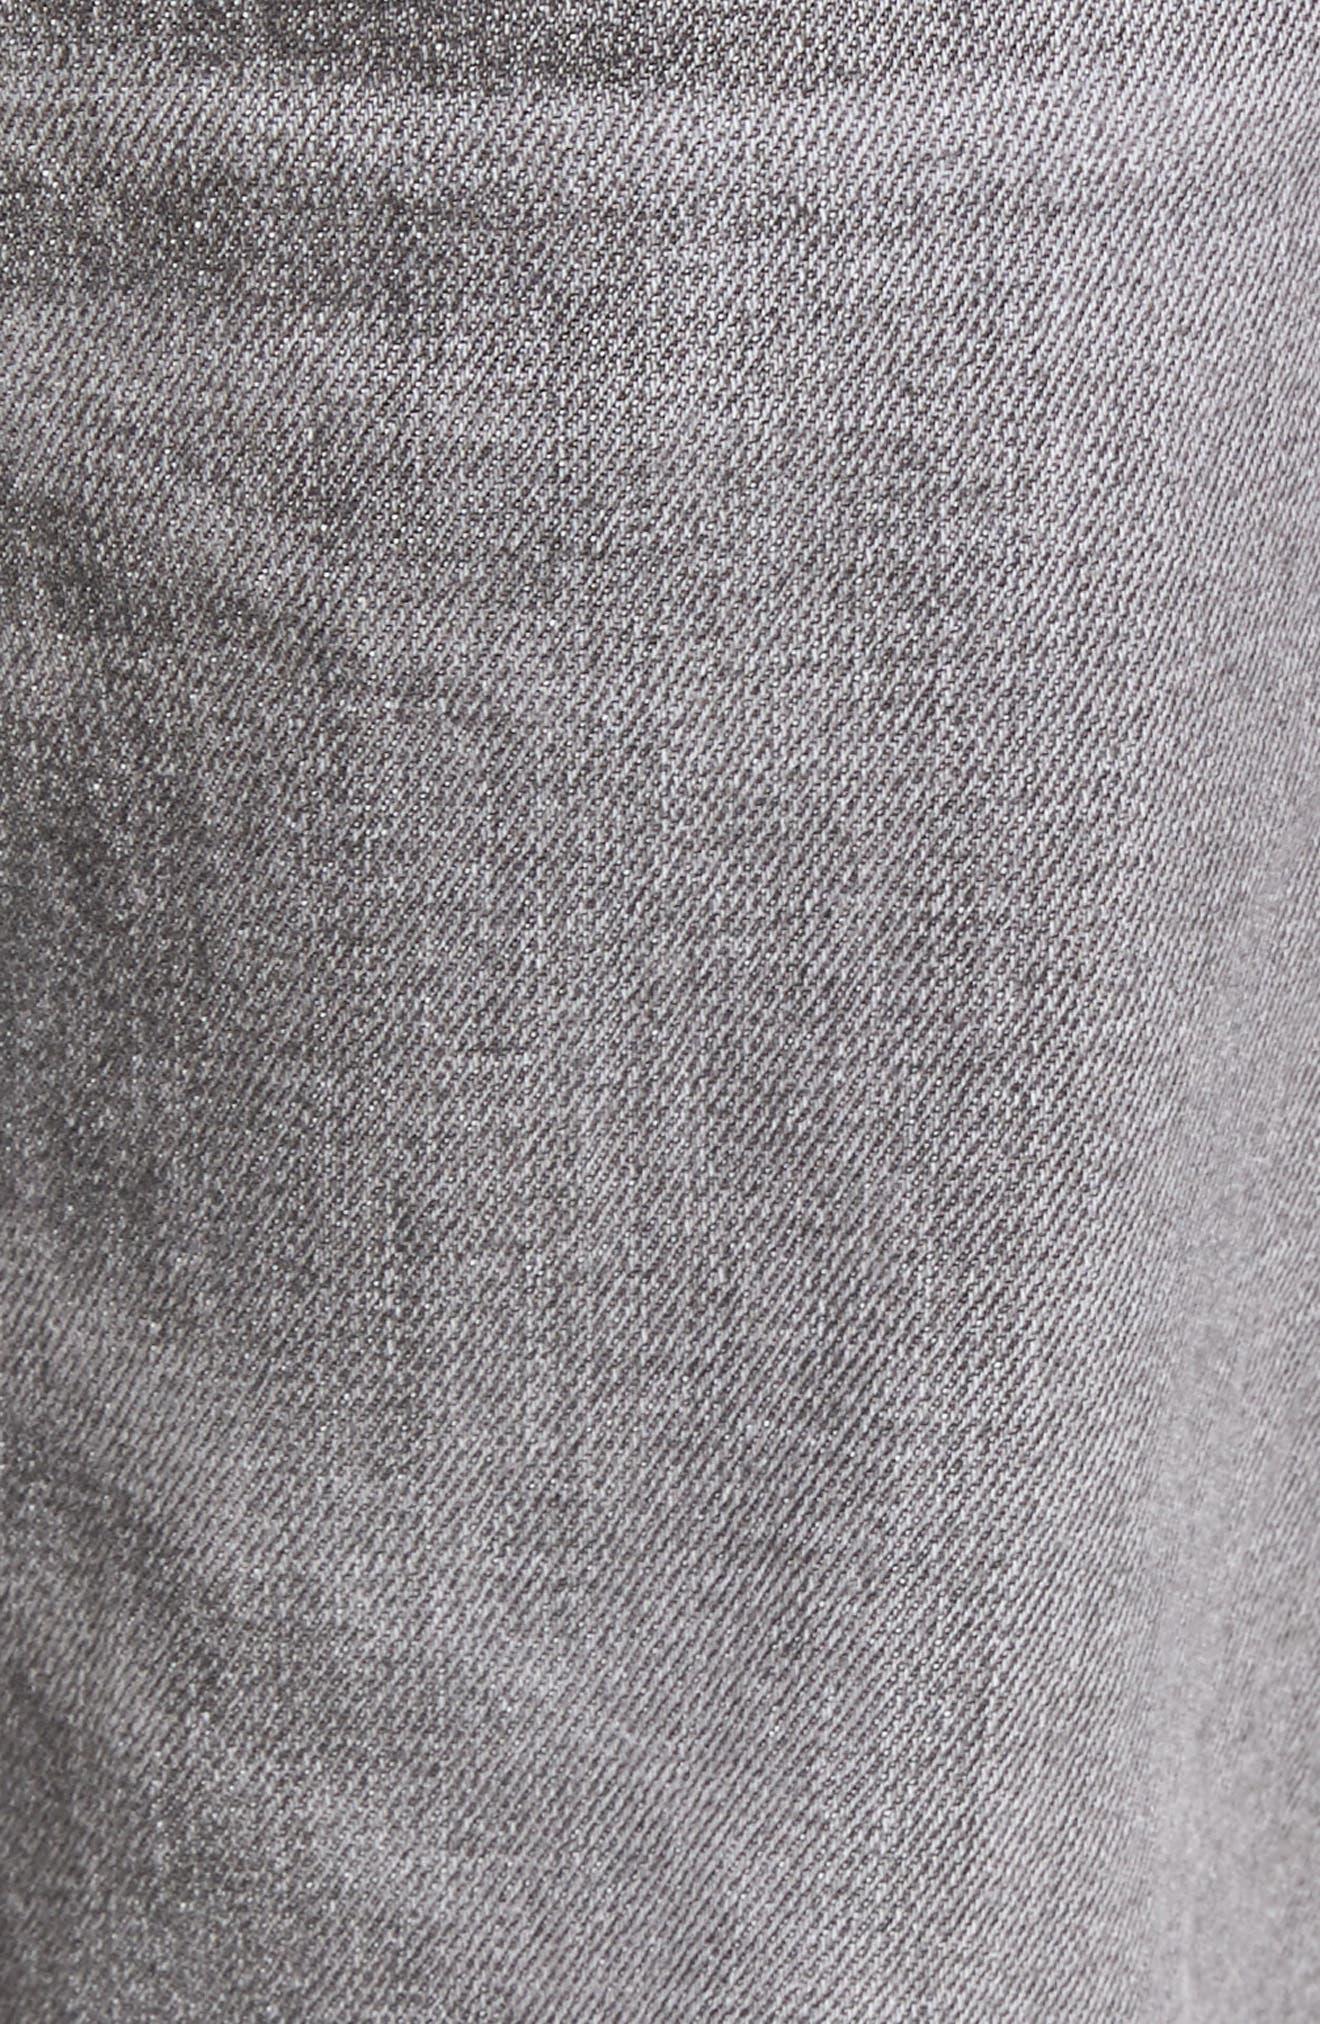 HUDSON JEANS,                             Blake Slim Fit Jeans,                             Alternate thumbnail 5, color,                             063